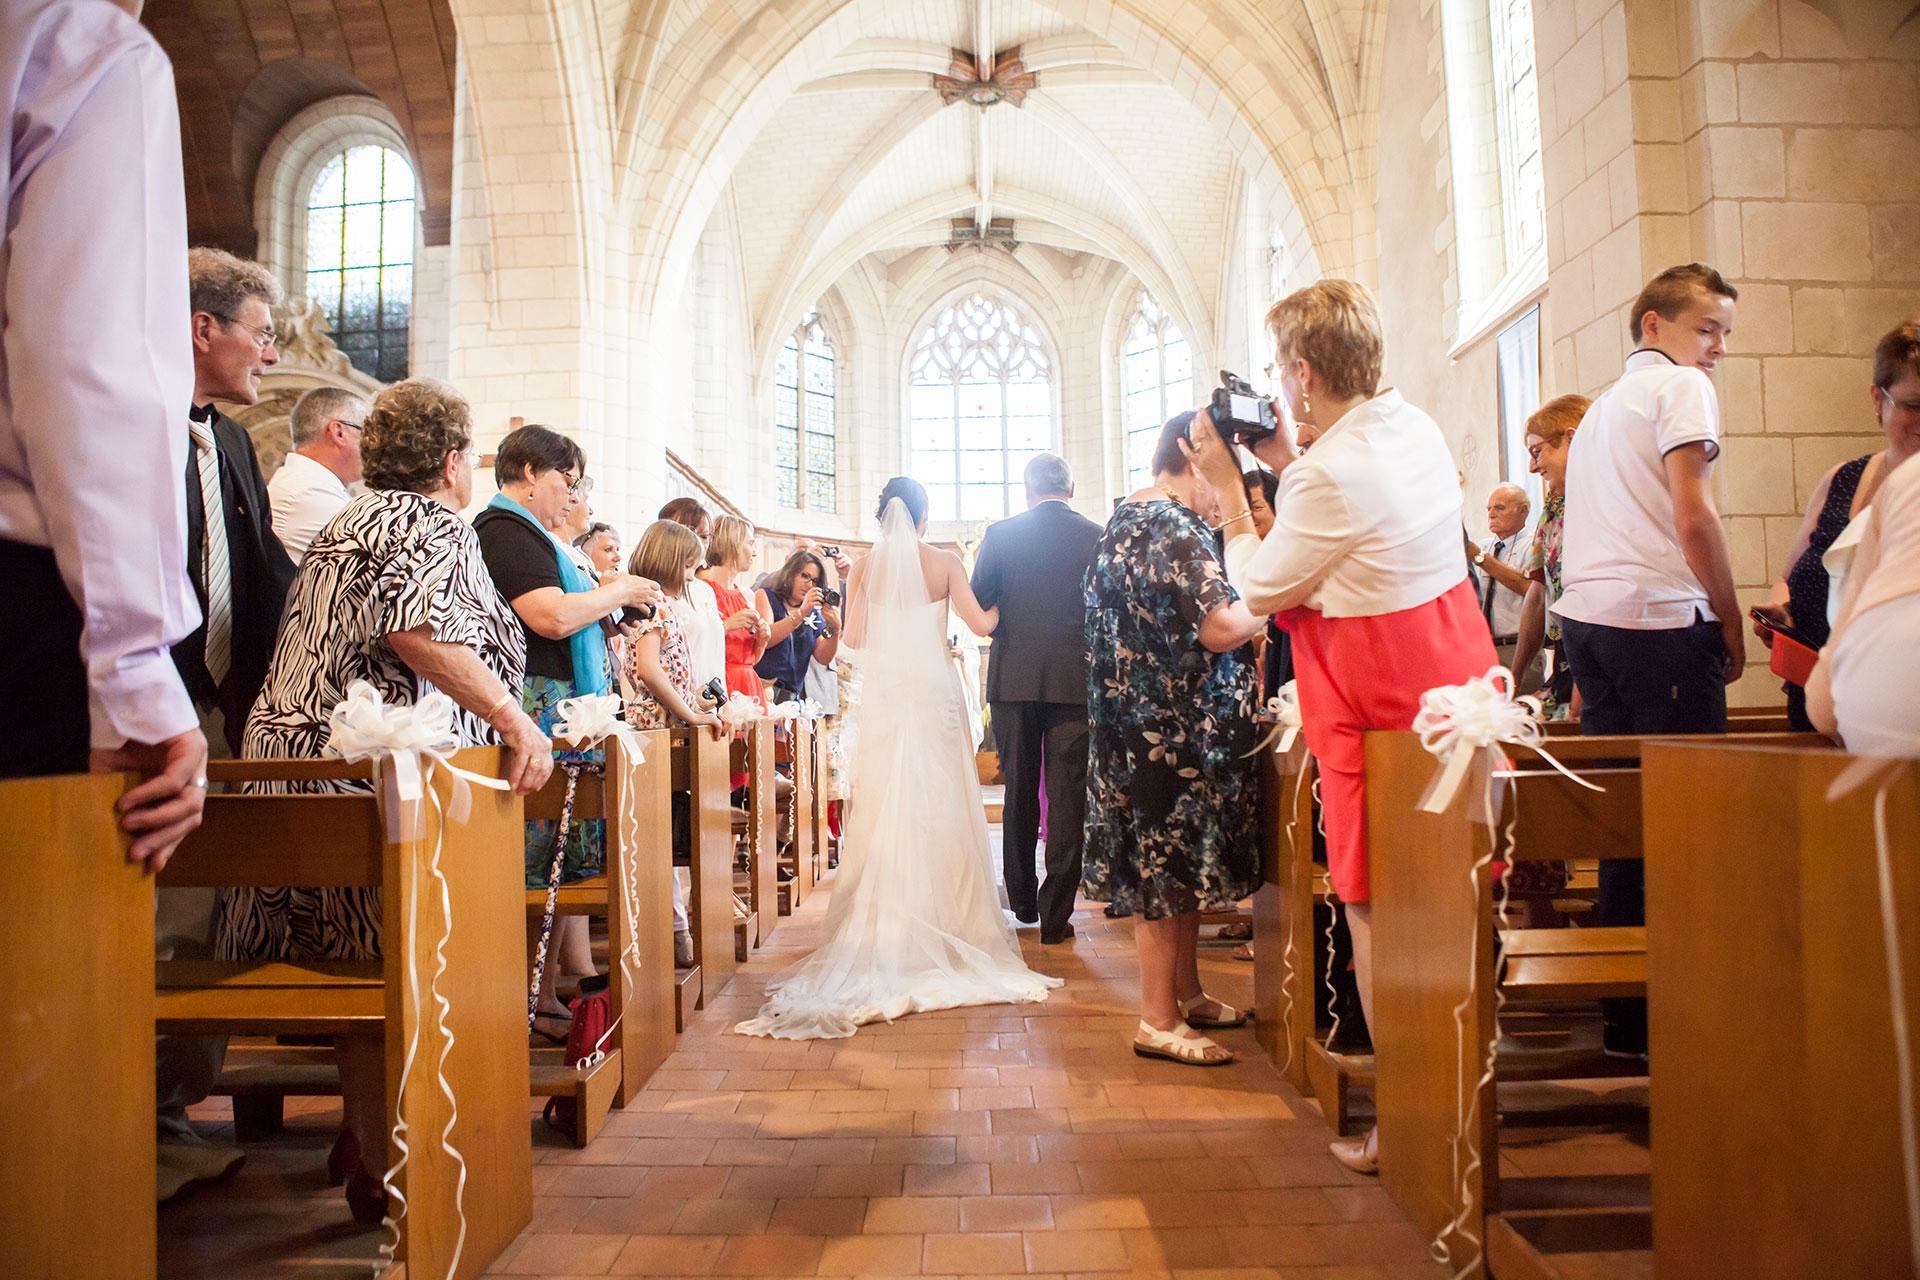 particuliers-evenements-mariages-oui-aurelie&geoffrey-08